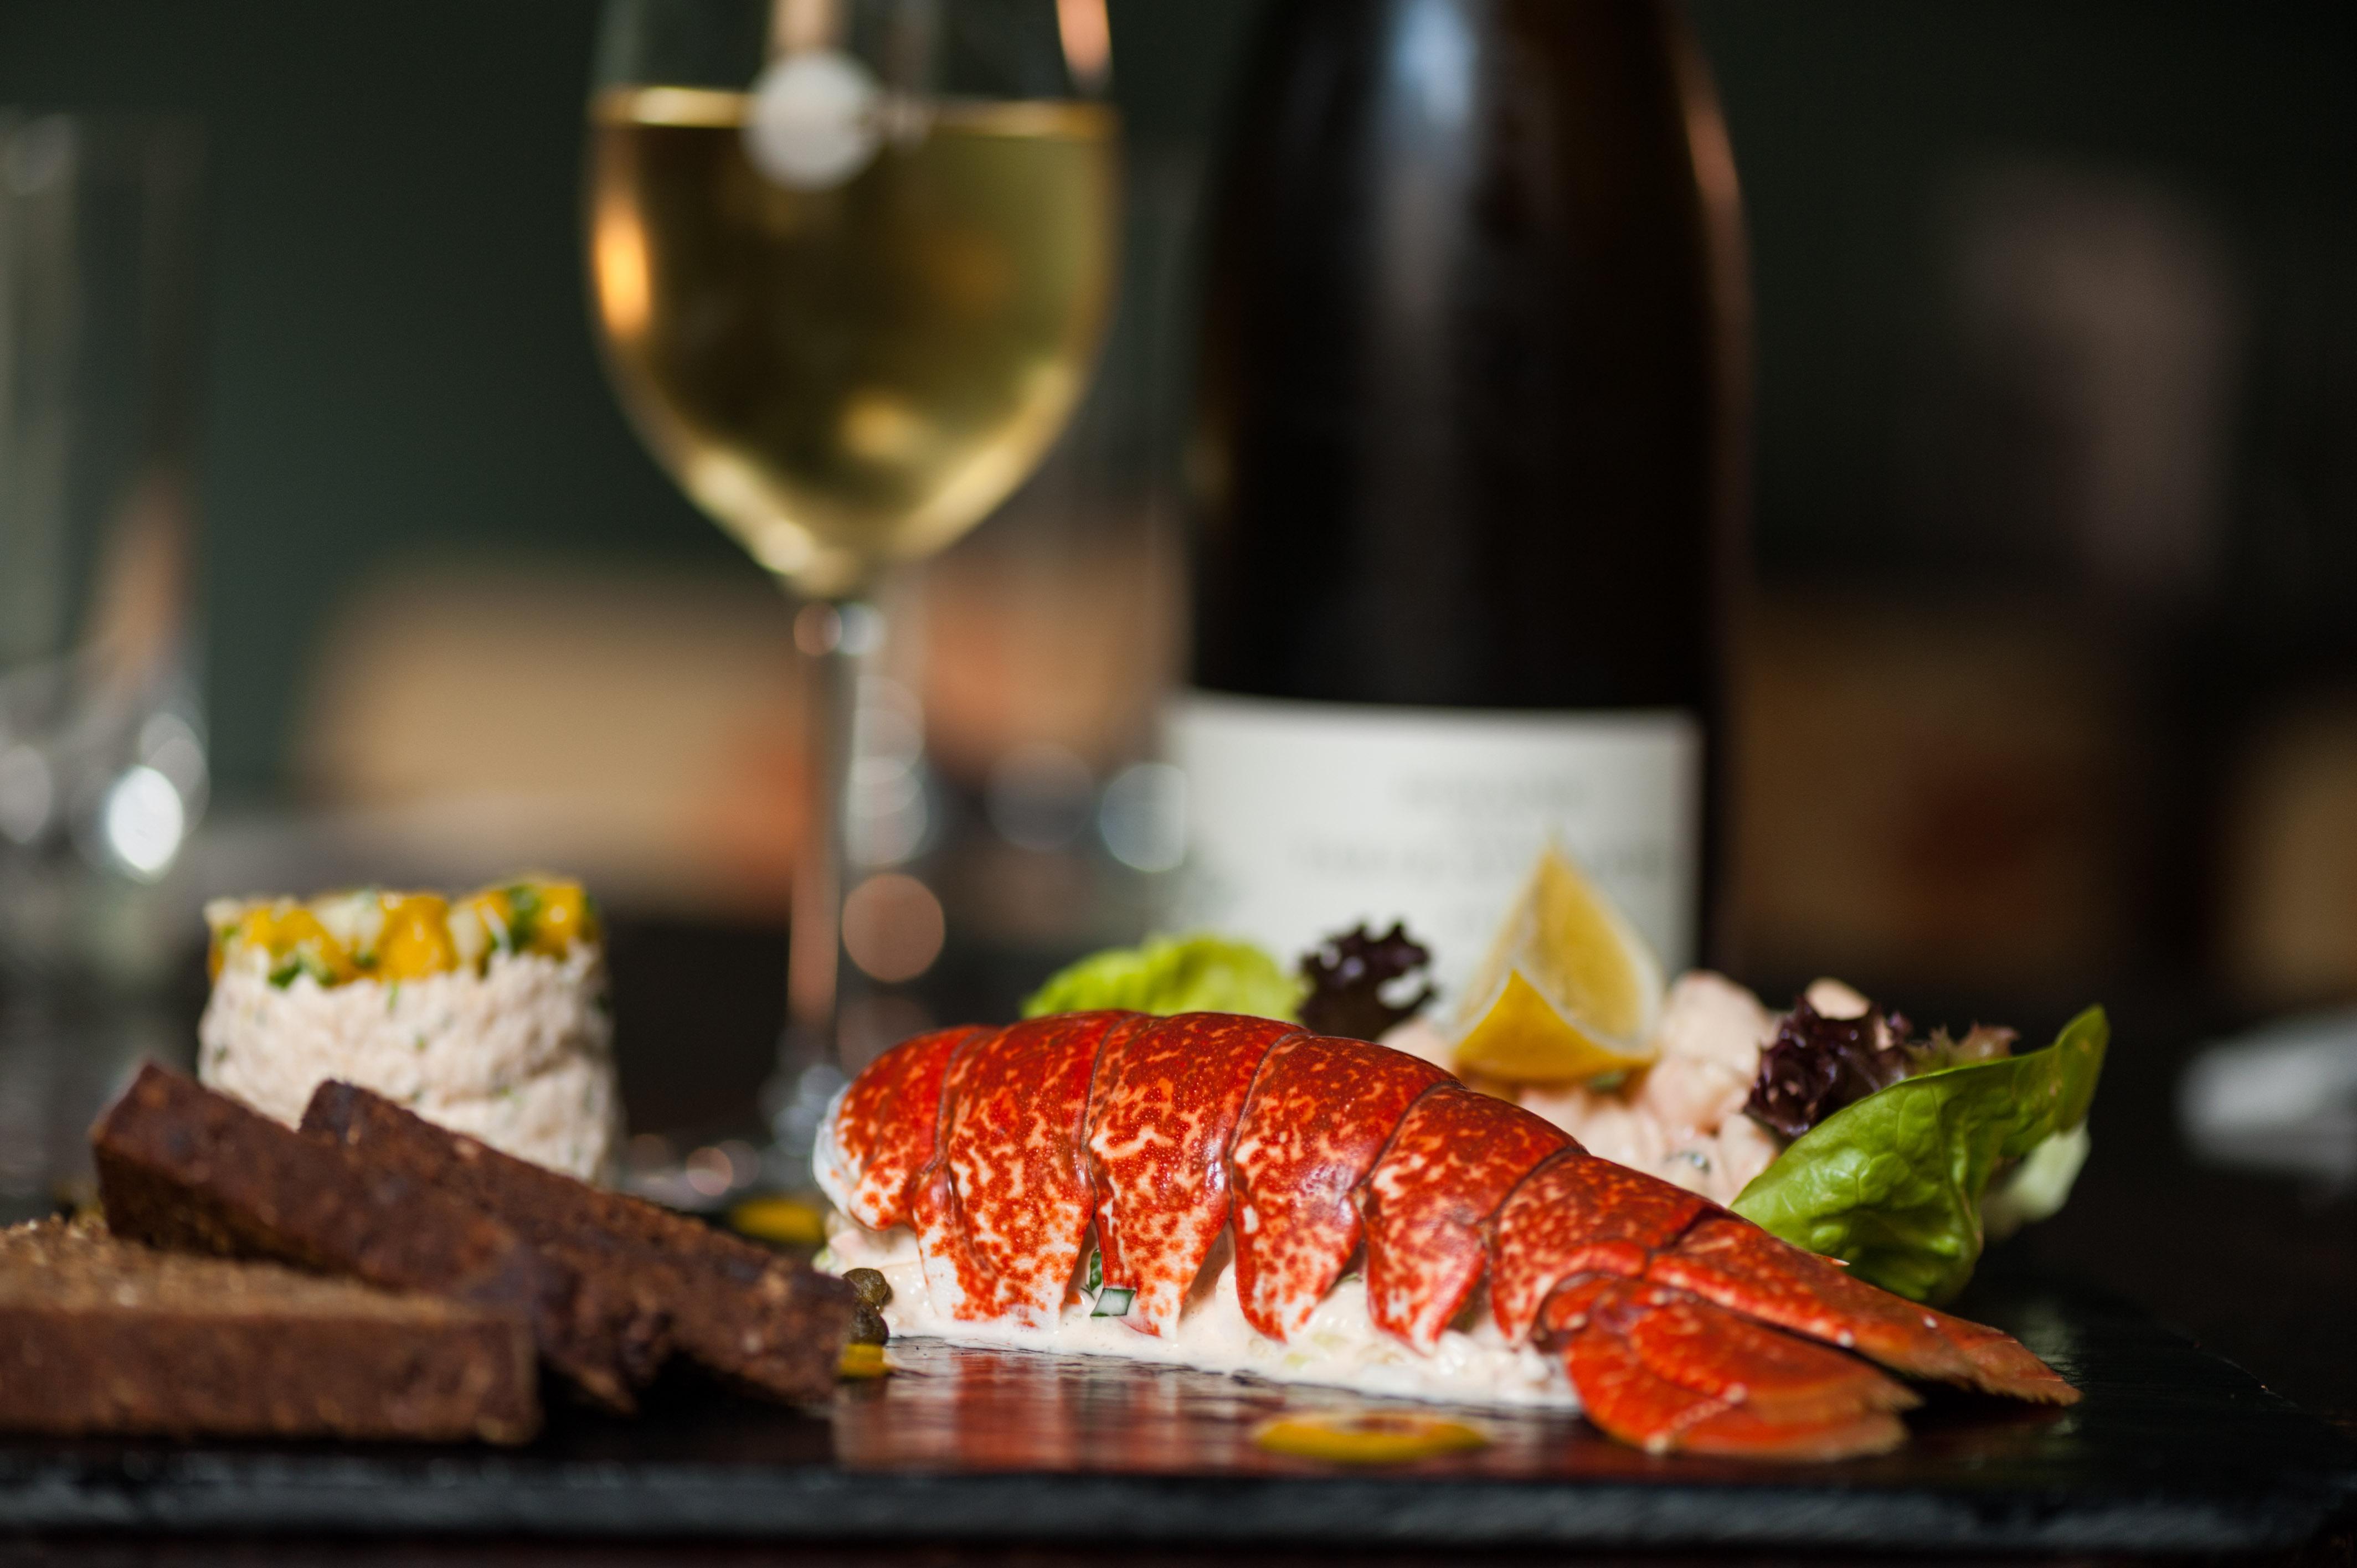 Elywinebar S Blog Seasonal Wine Food And Craft Beer